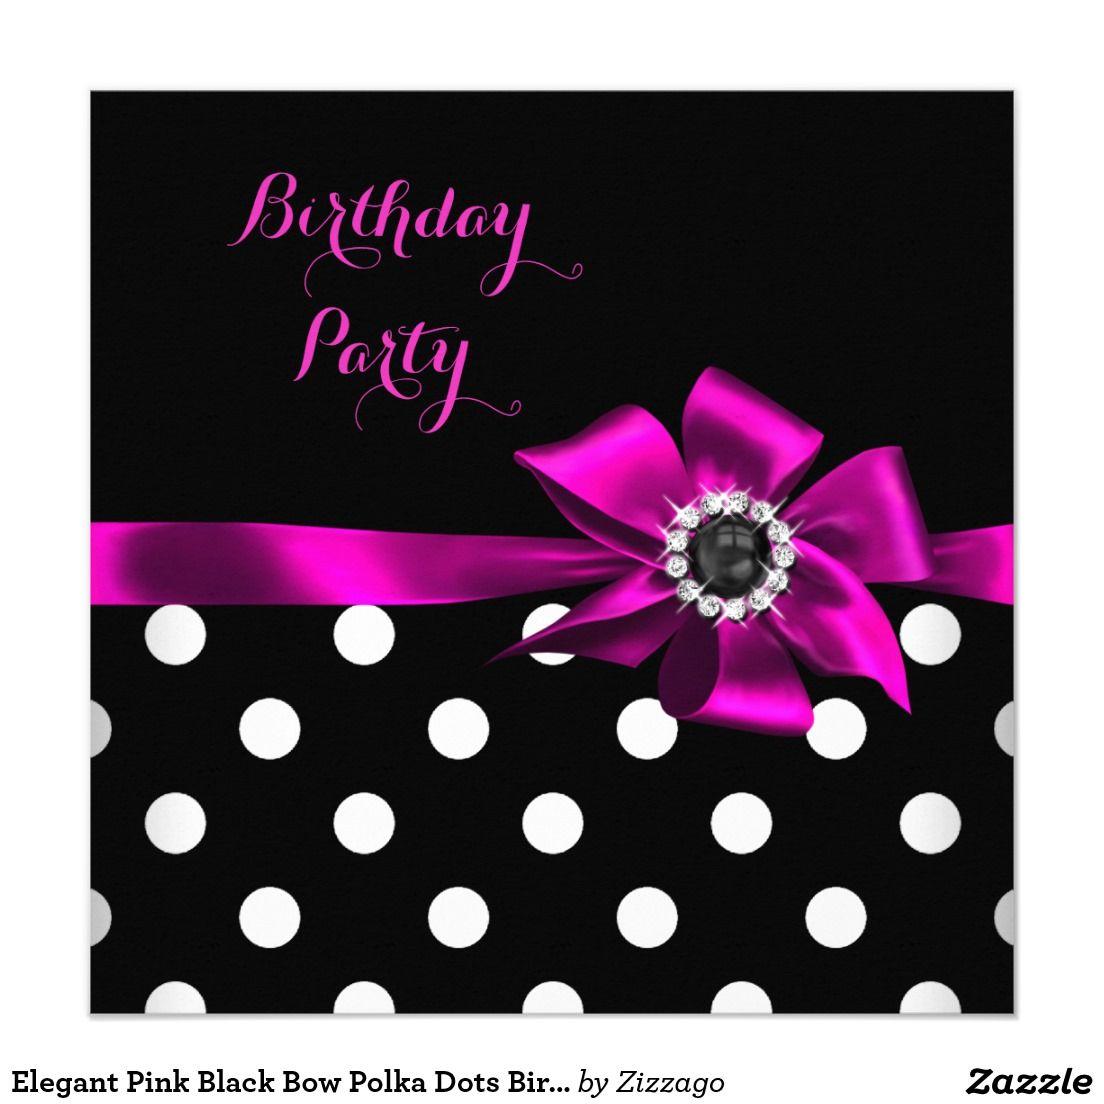 Elegant Pink Black Bow Polka Dots Birthday Party Card | Polka dot ...